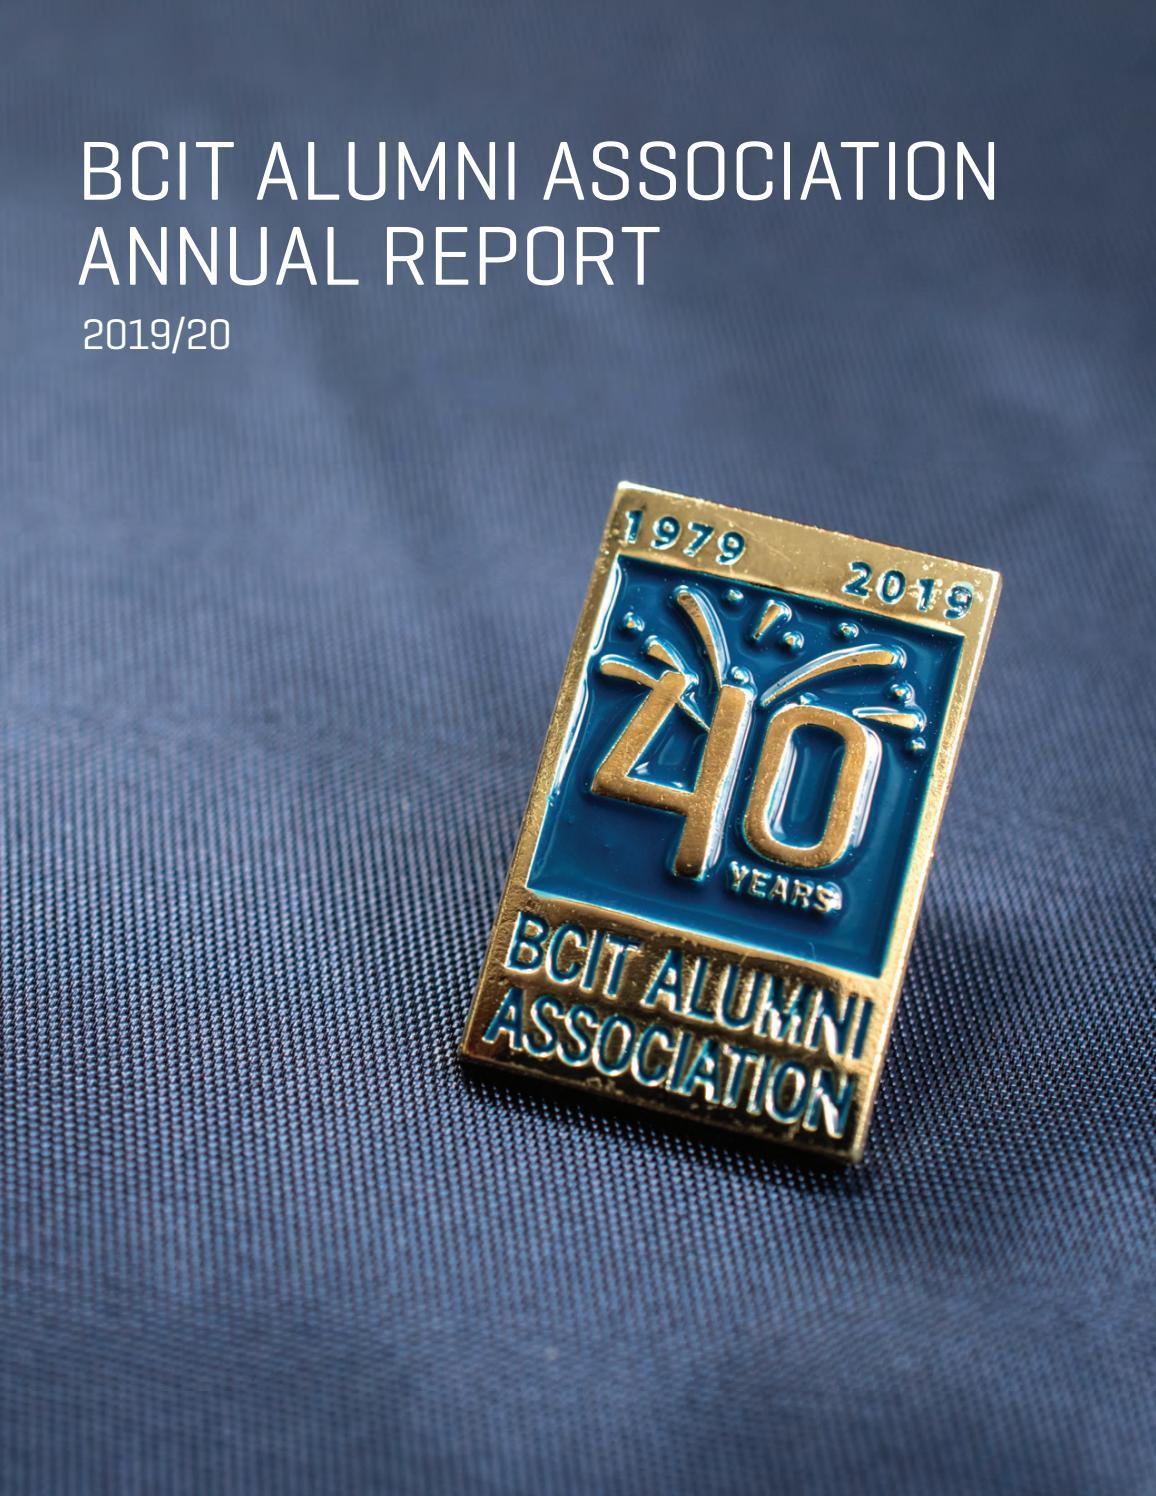 2019 20 Bcit Alumni Association Annual Report By Bcit Issuu